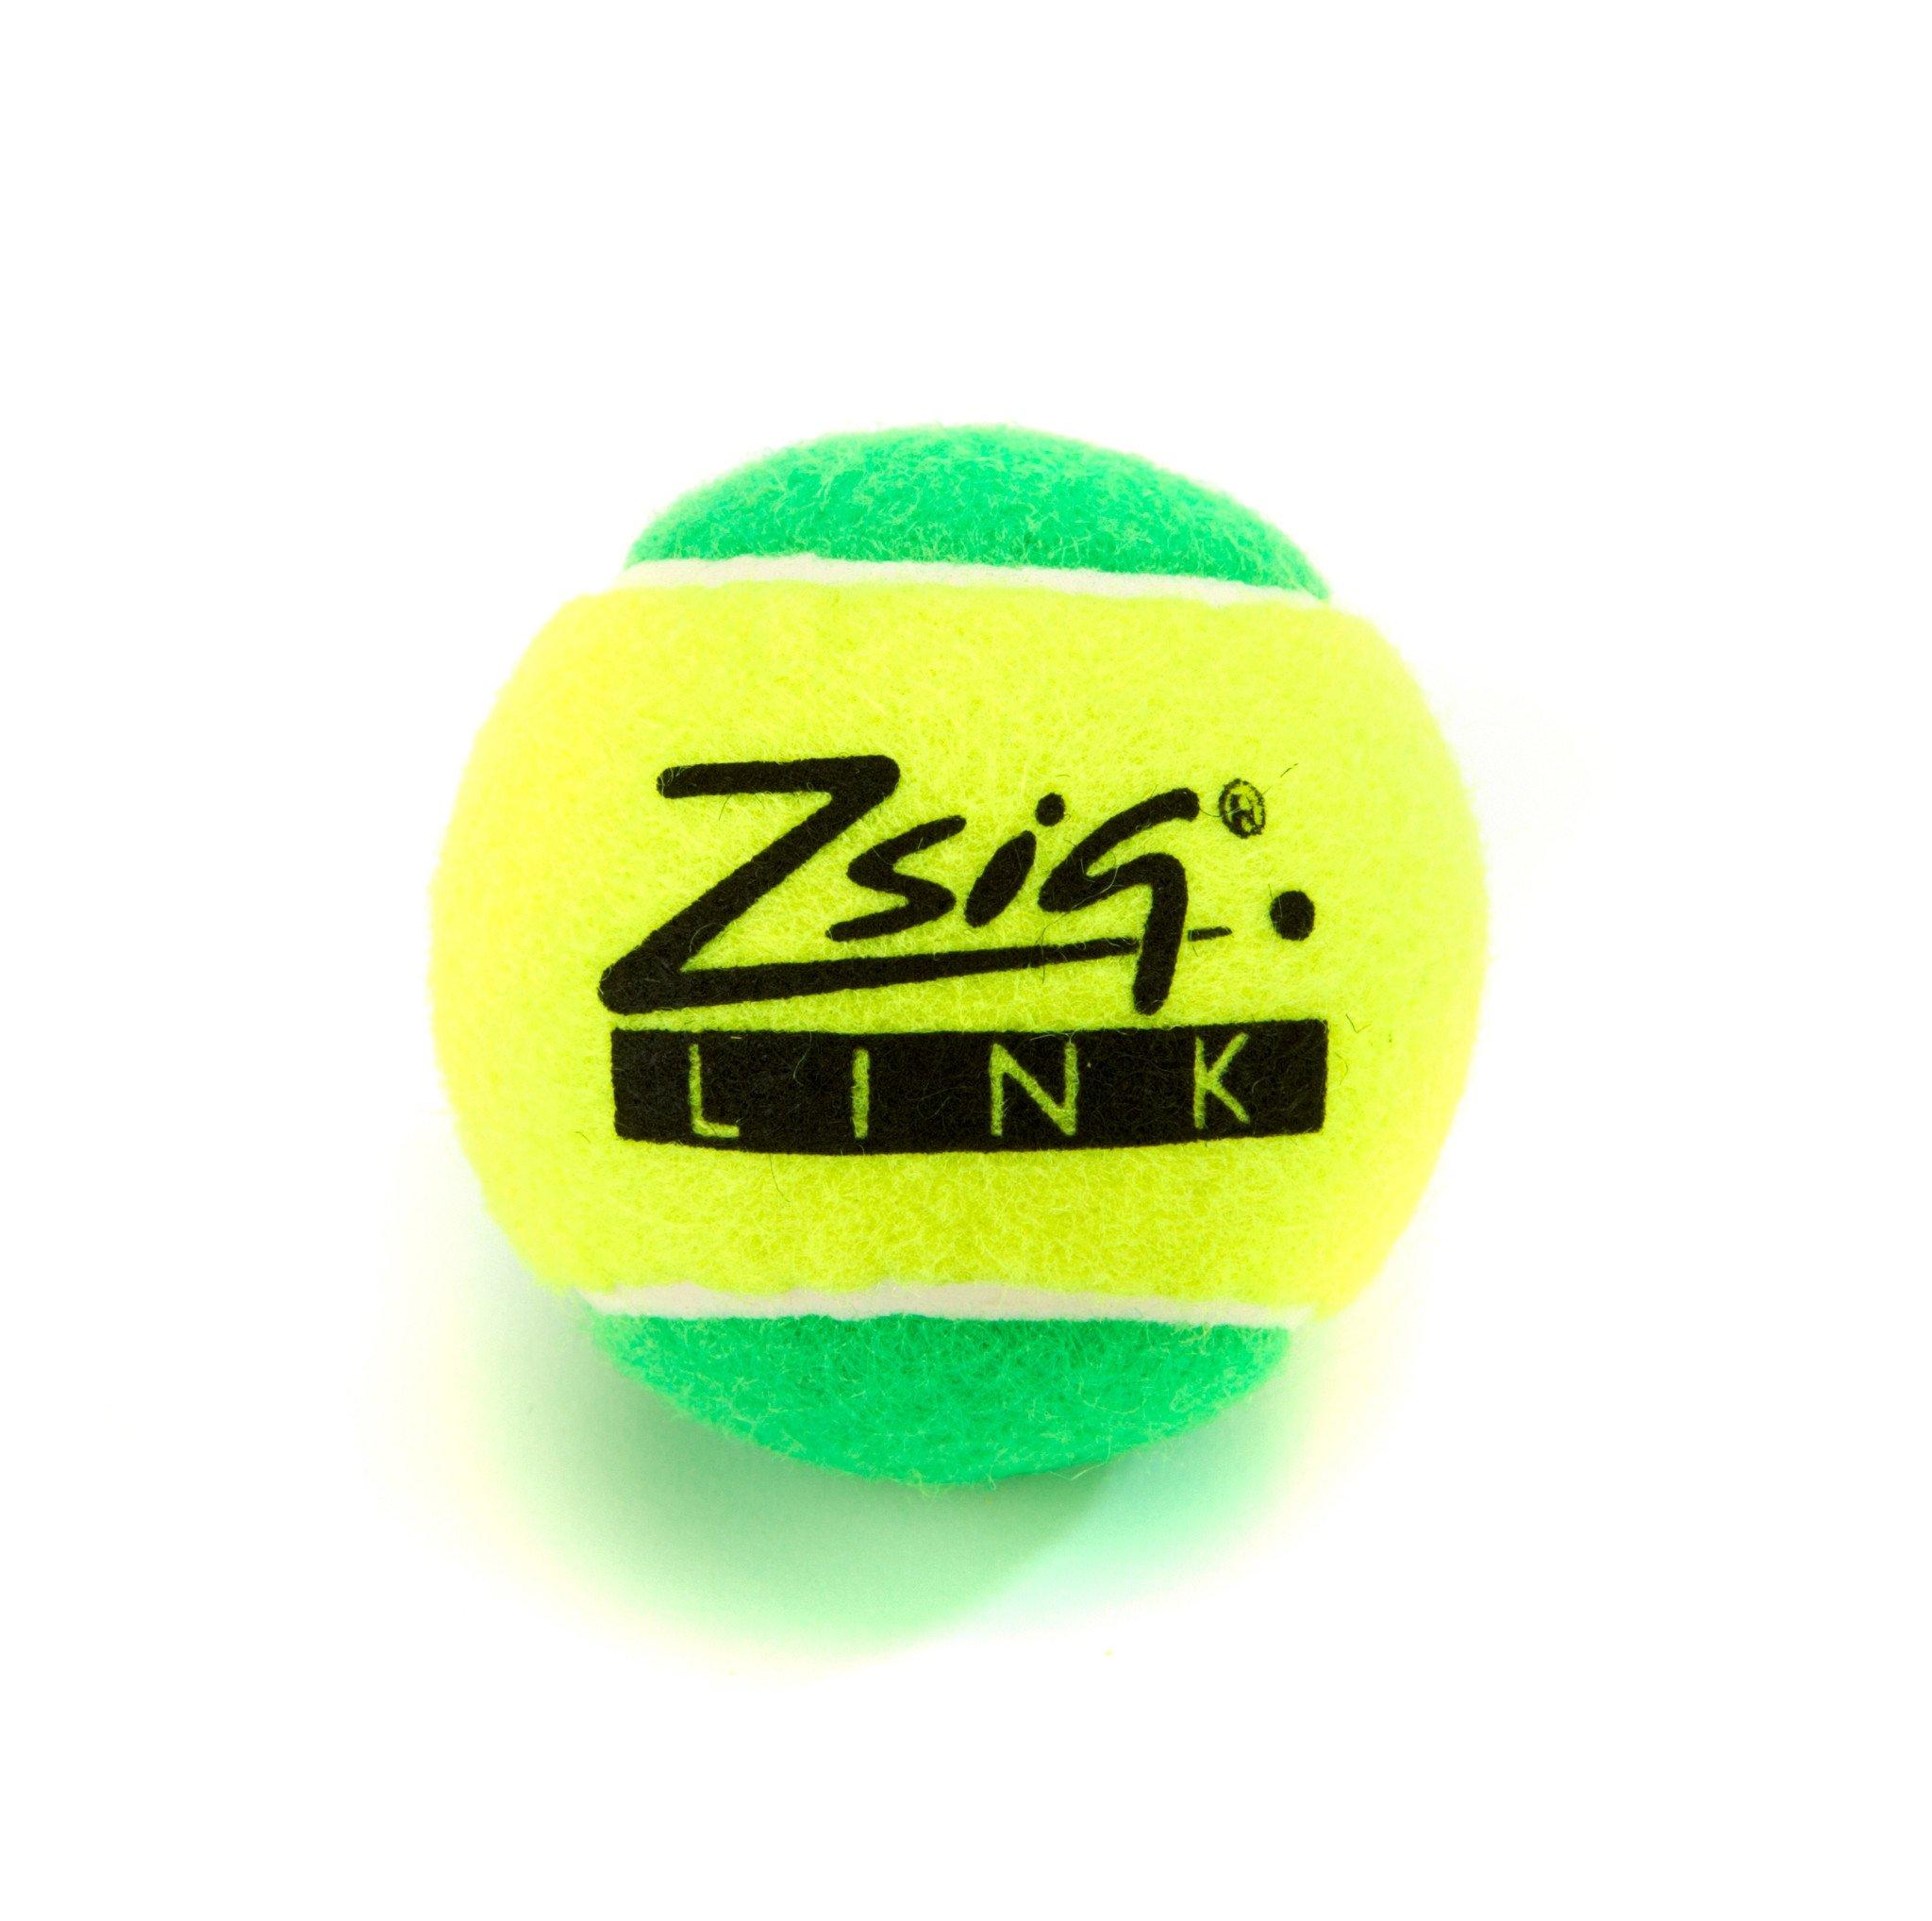 2048x2036 Mini Tennis Balls Zsig